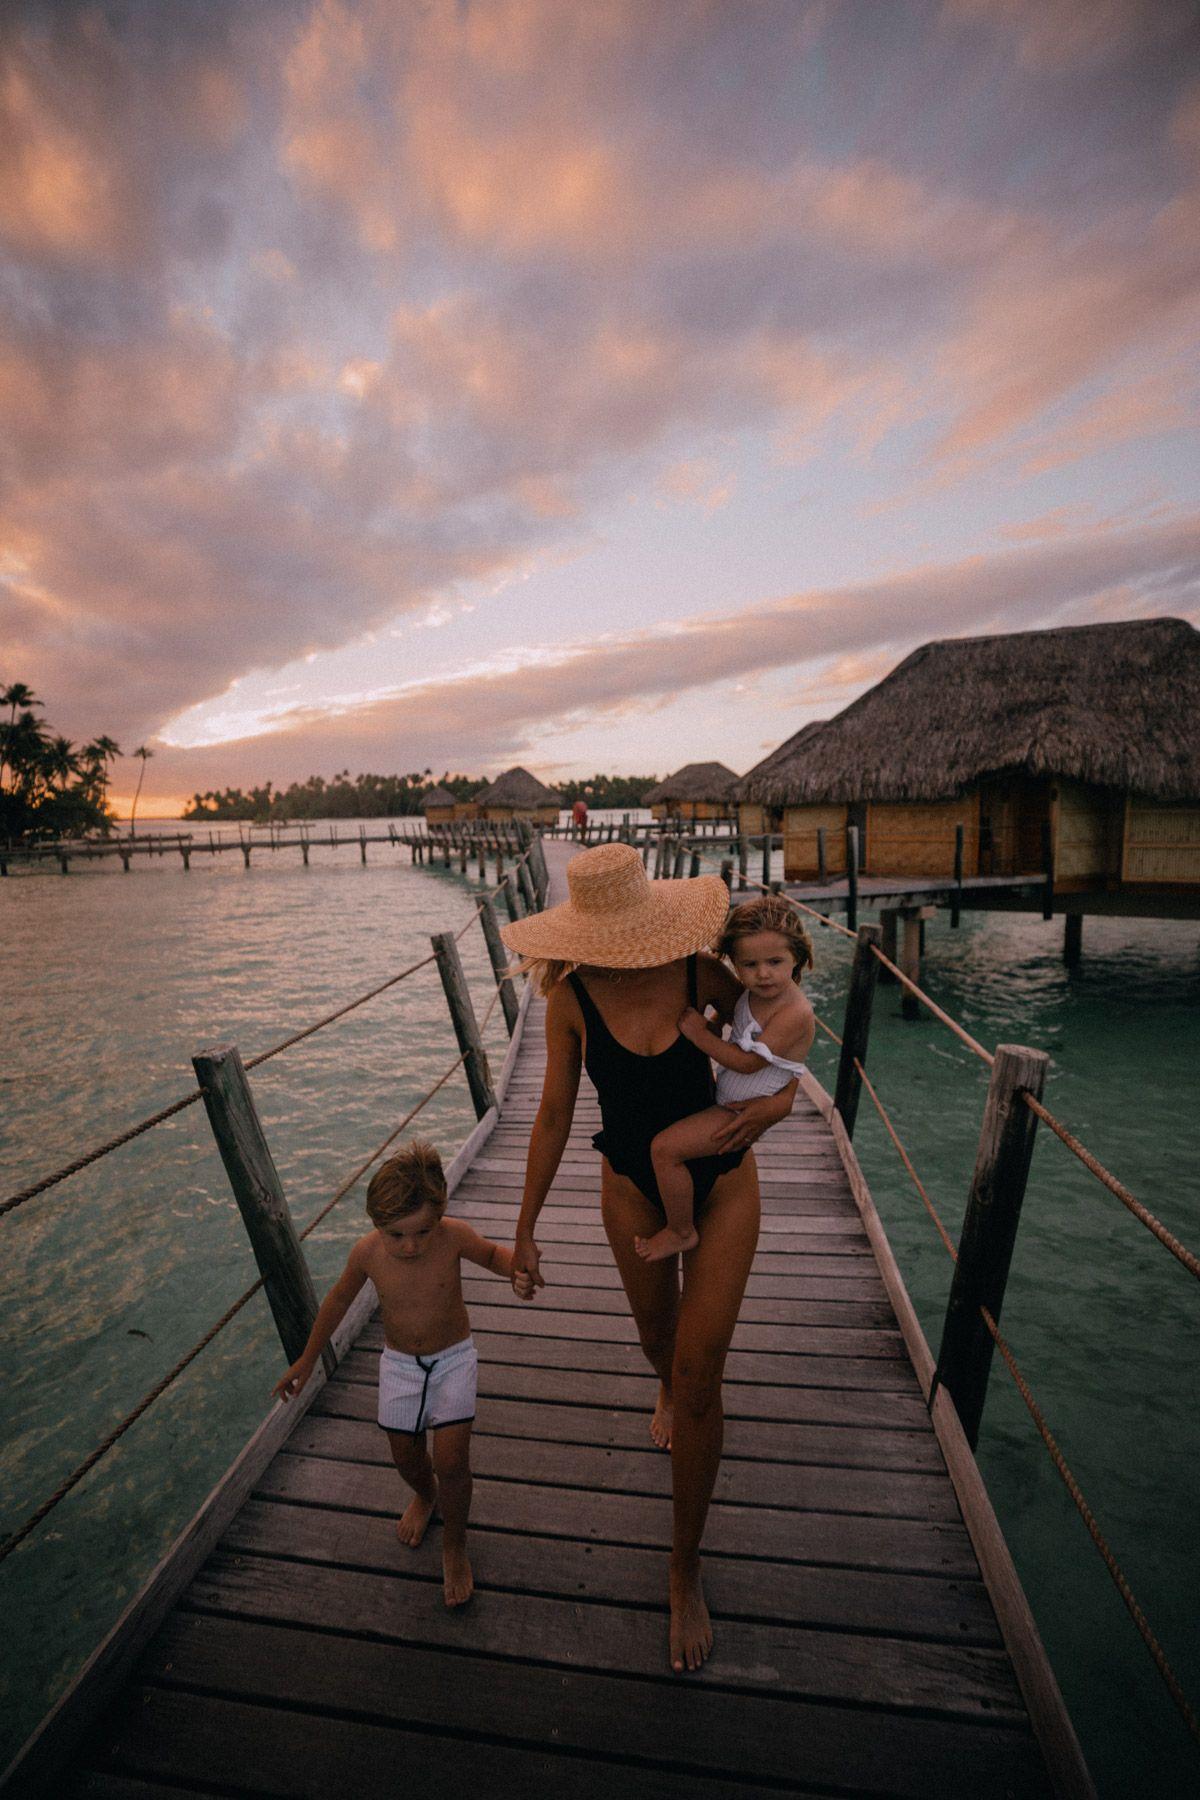 Tahiti Travel Diary : Fun in the Sun - Barefoot Blonde by Amber Fillerup Clark